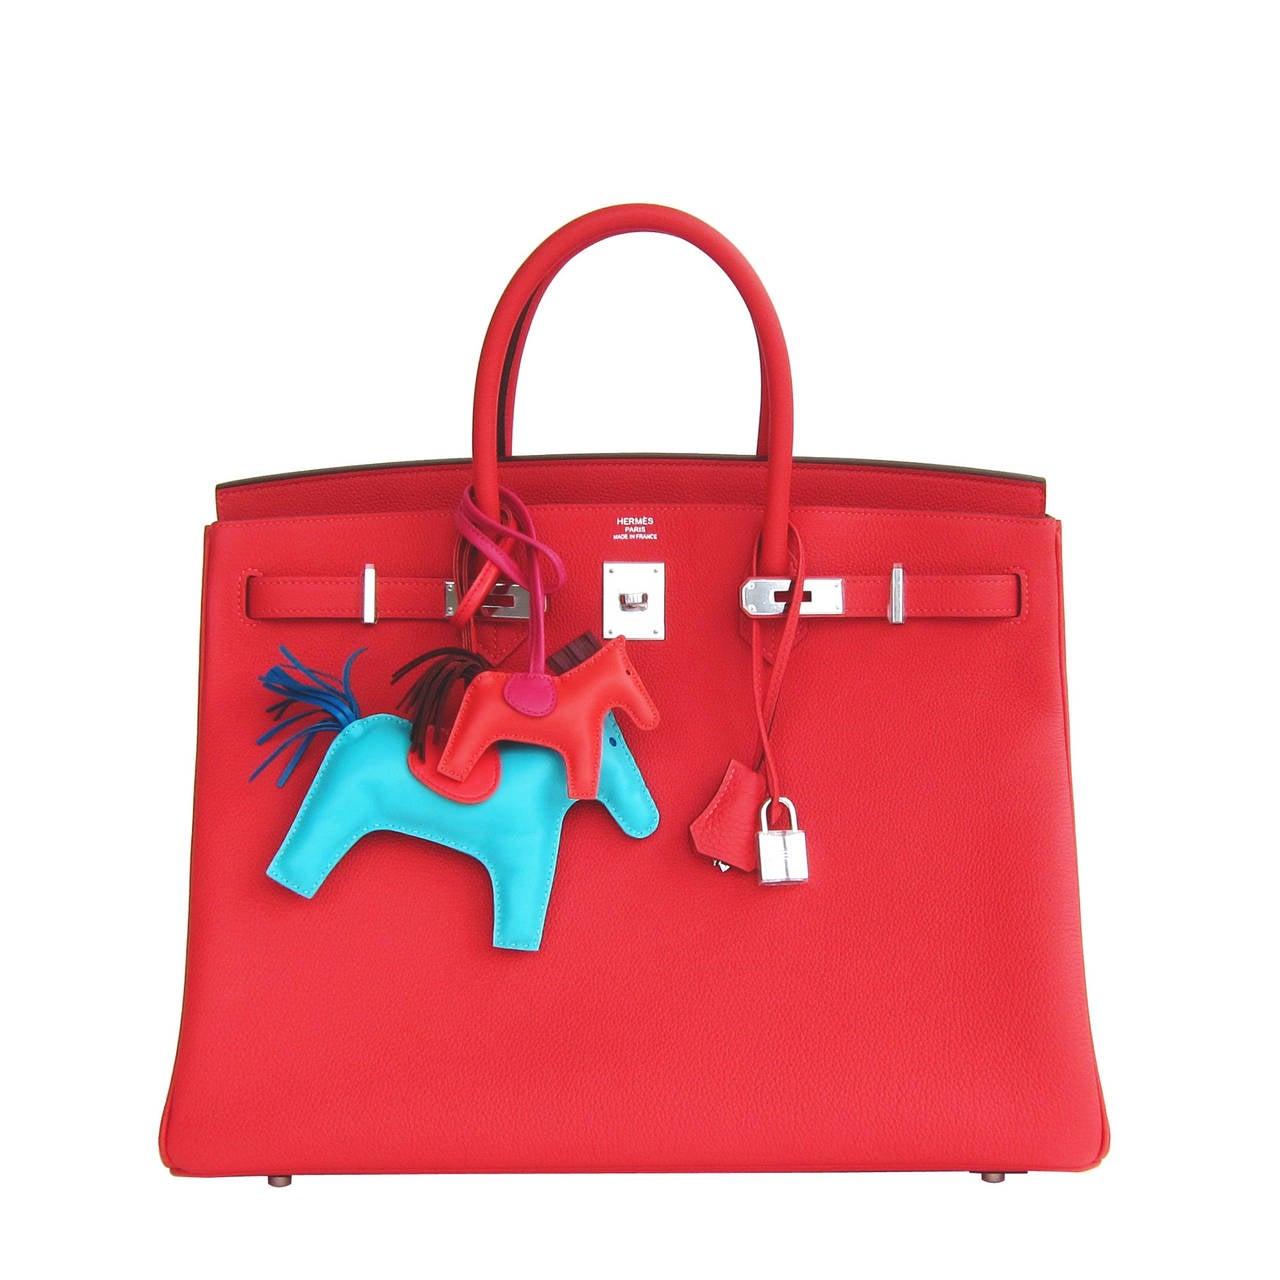 Hermes Rouge Pivoine 40cm Togo Birkin Bag Palladium Luscious For Sale